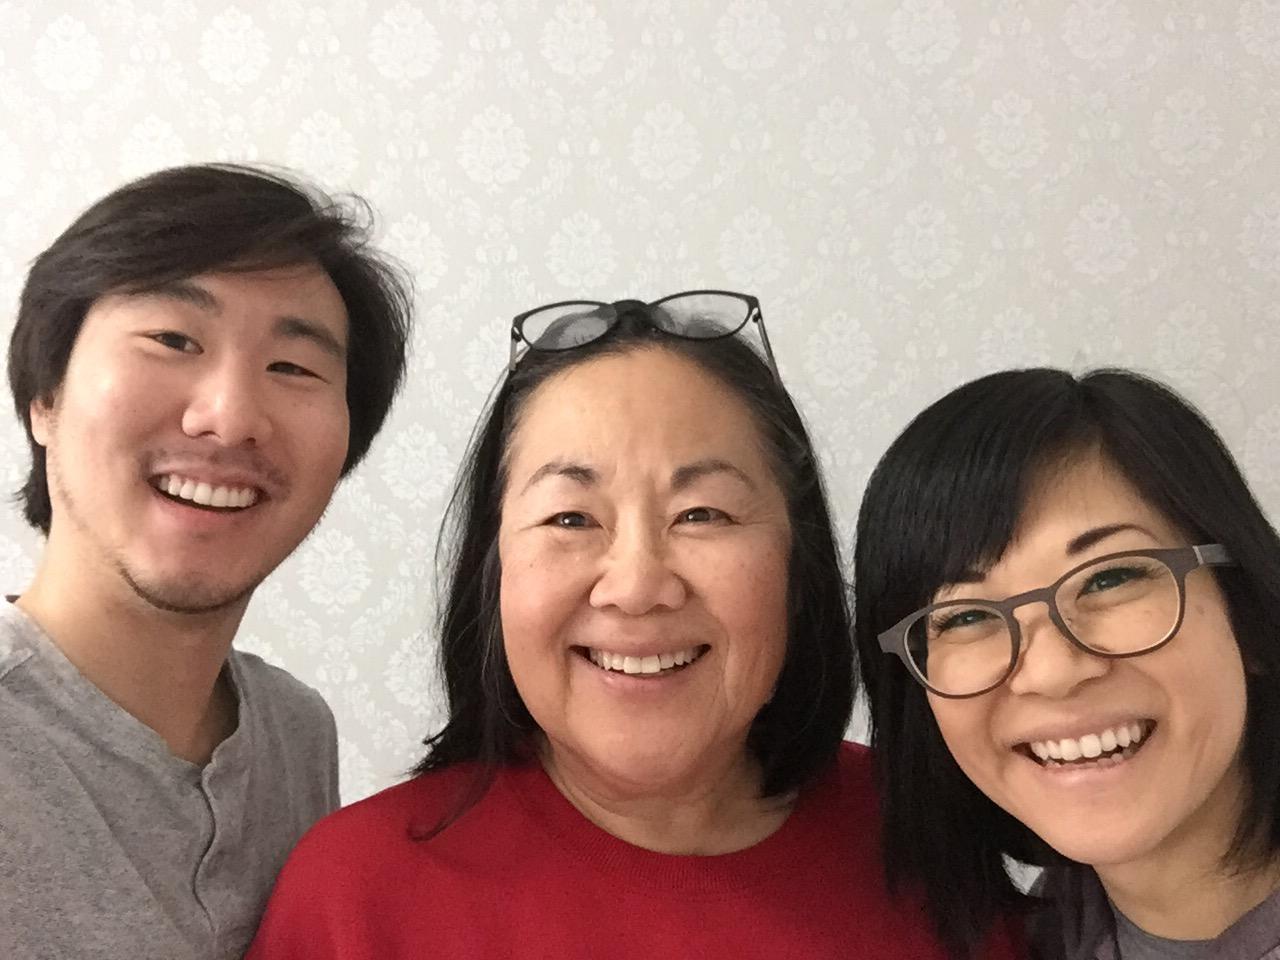 Keiko Agena & Emily Kuroda with Asian AF creator Will Choi